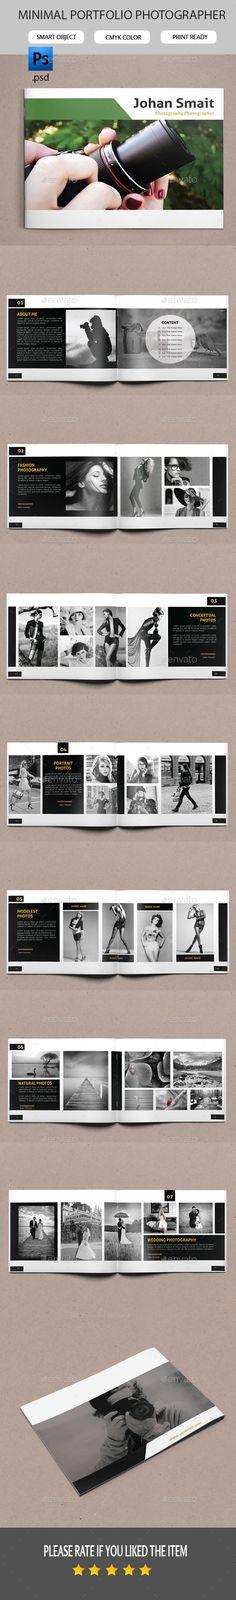 Portfolio Photographer Album Template #design Download: http://graphicriver.net/item/portfolio-photographer/11319129?ref=ksioks